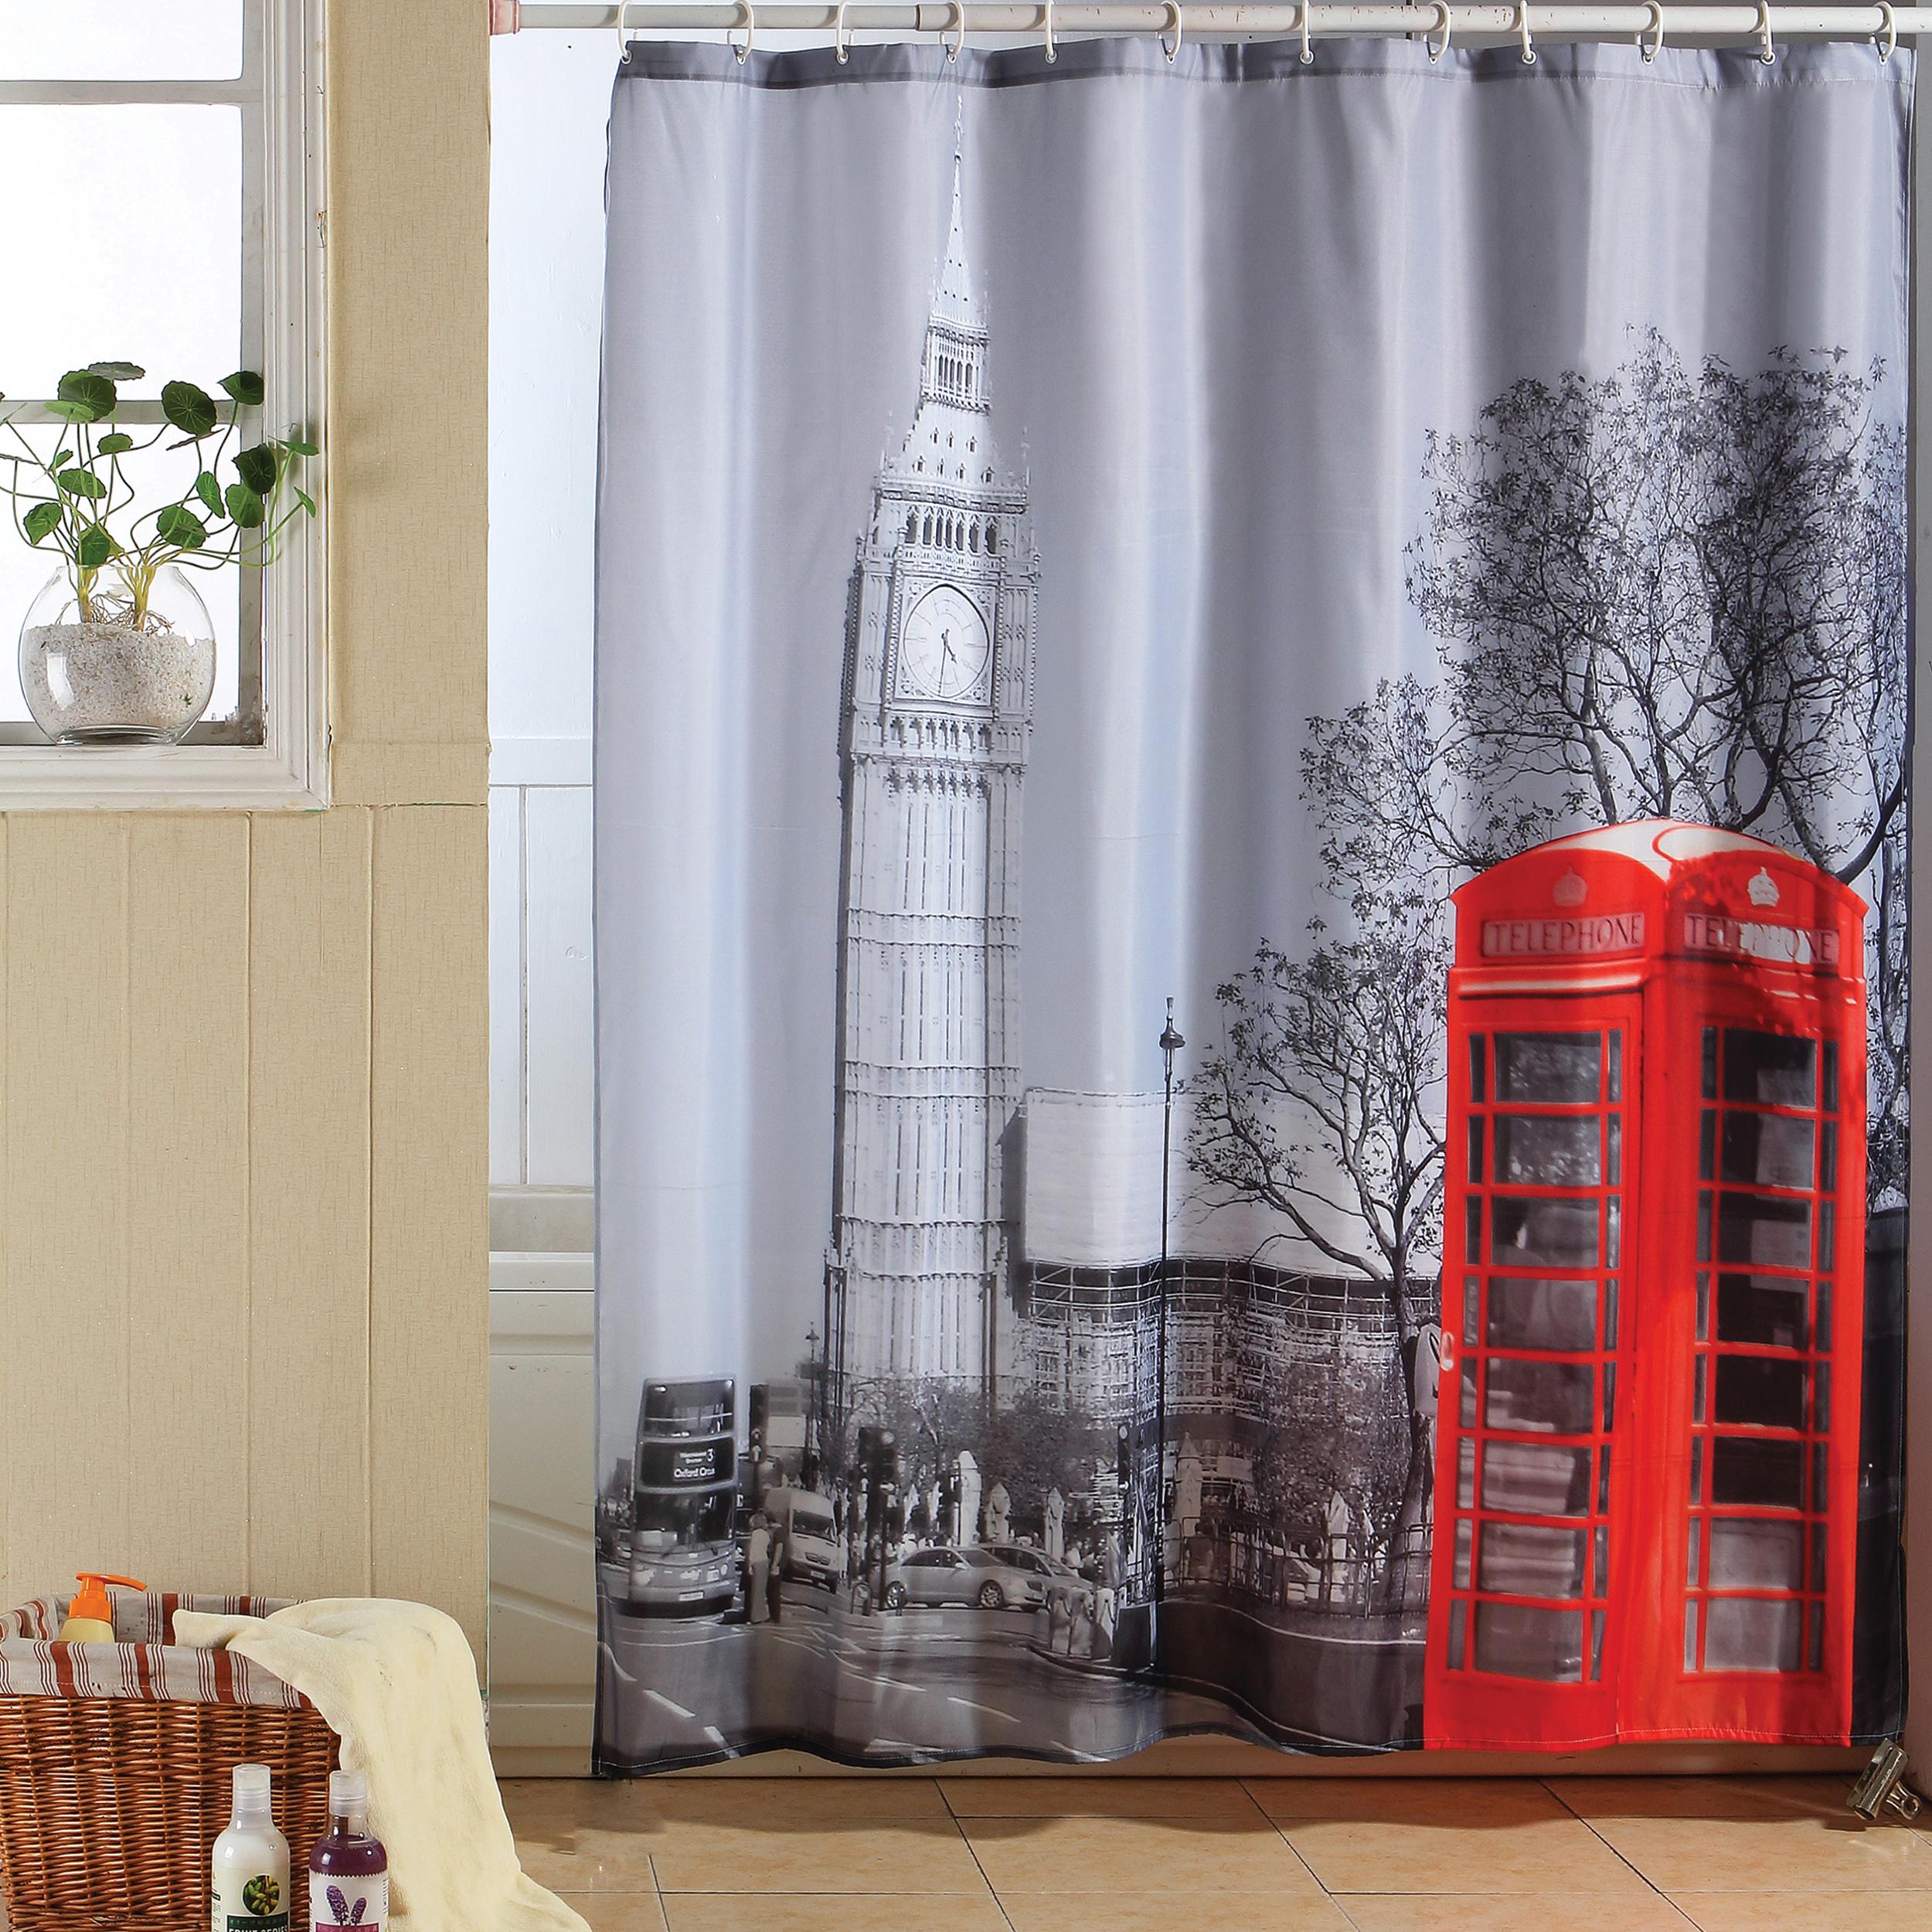 MSV Duschvorhang 180x200cm Anti Schimmel Textil Badewannenvorhang Wannenvorhang London